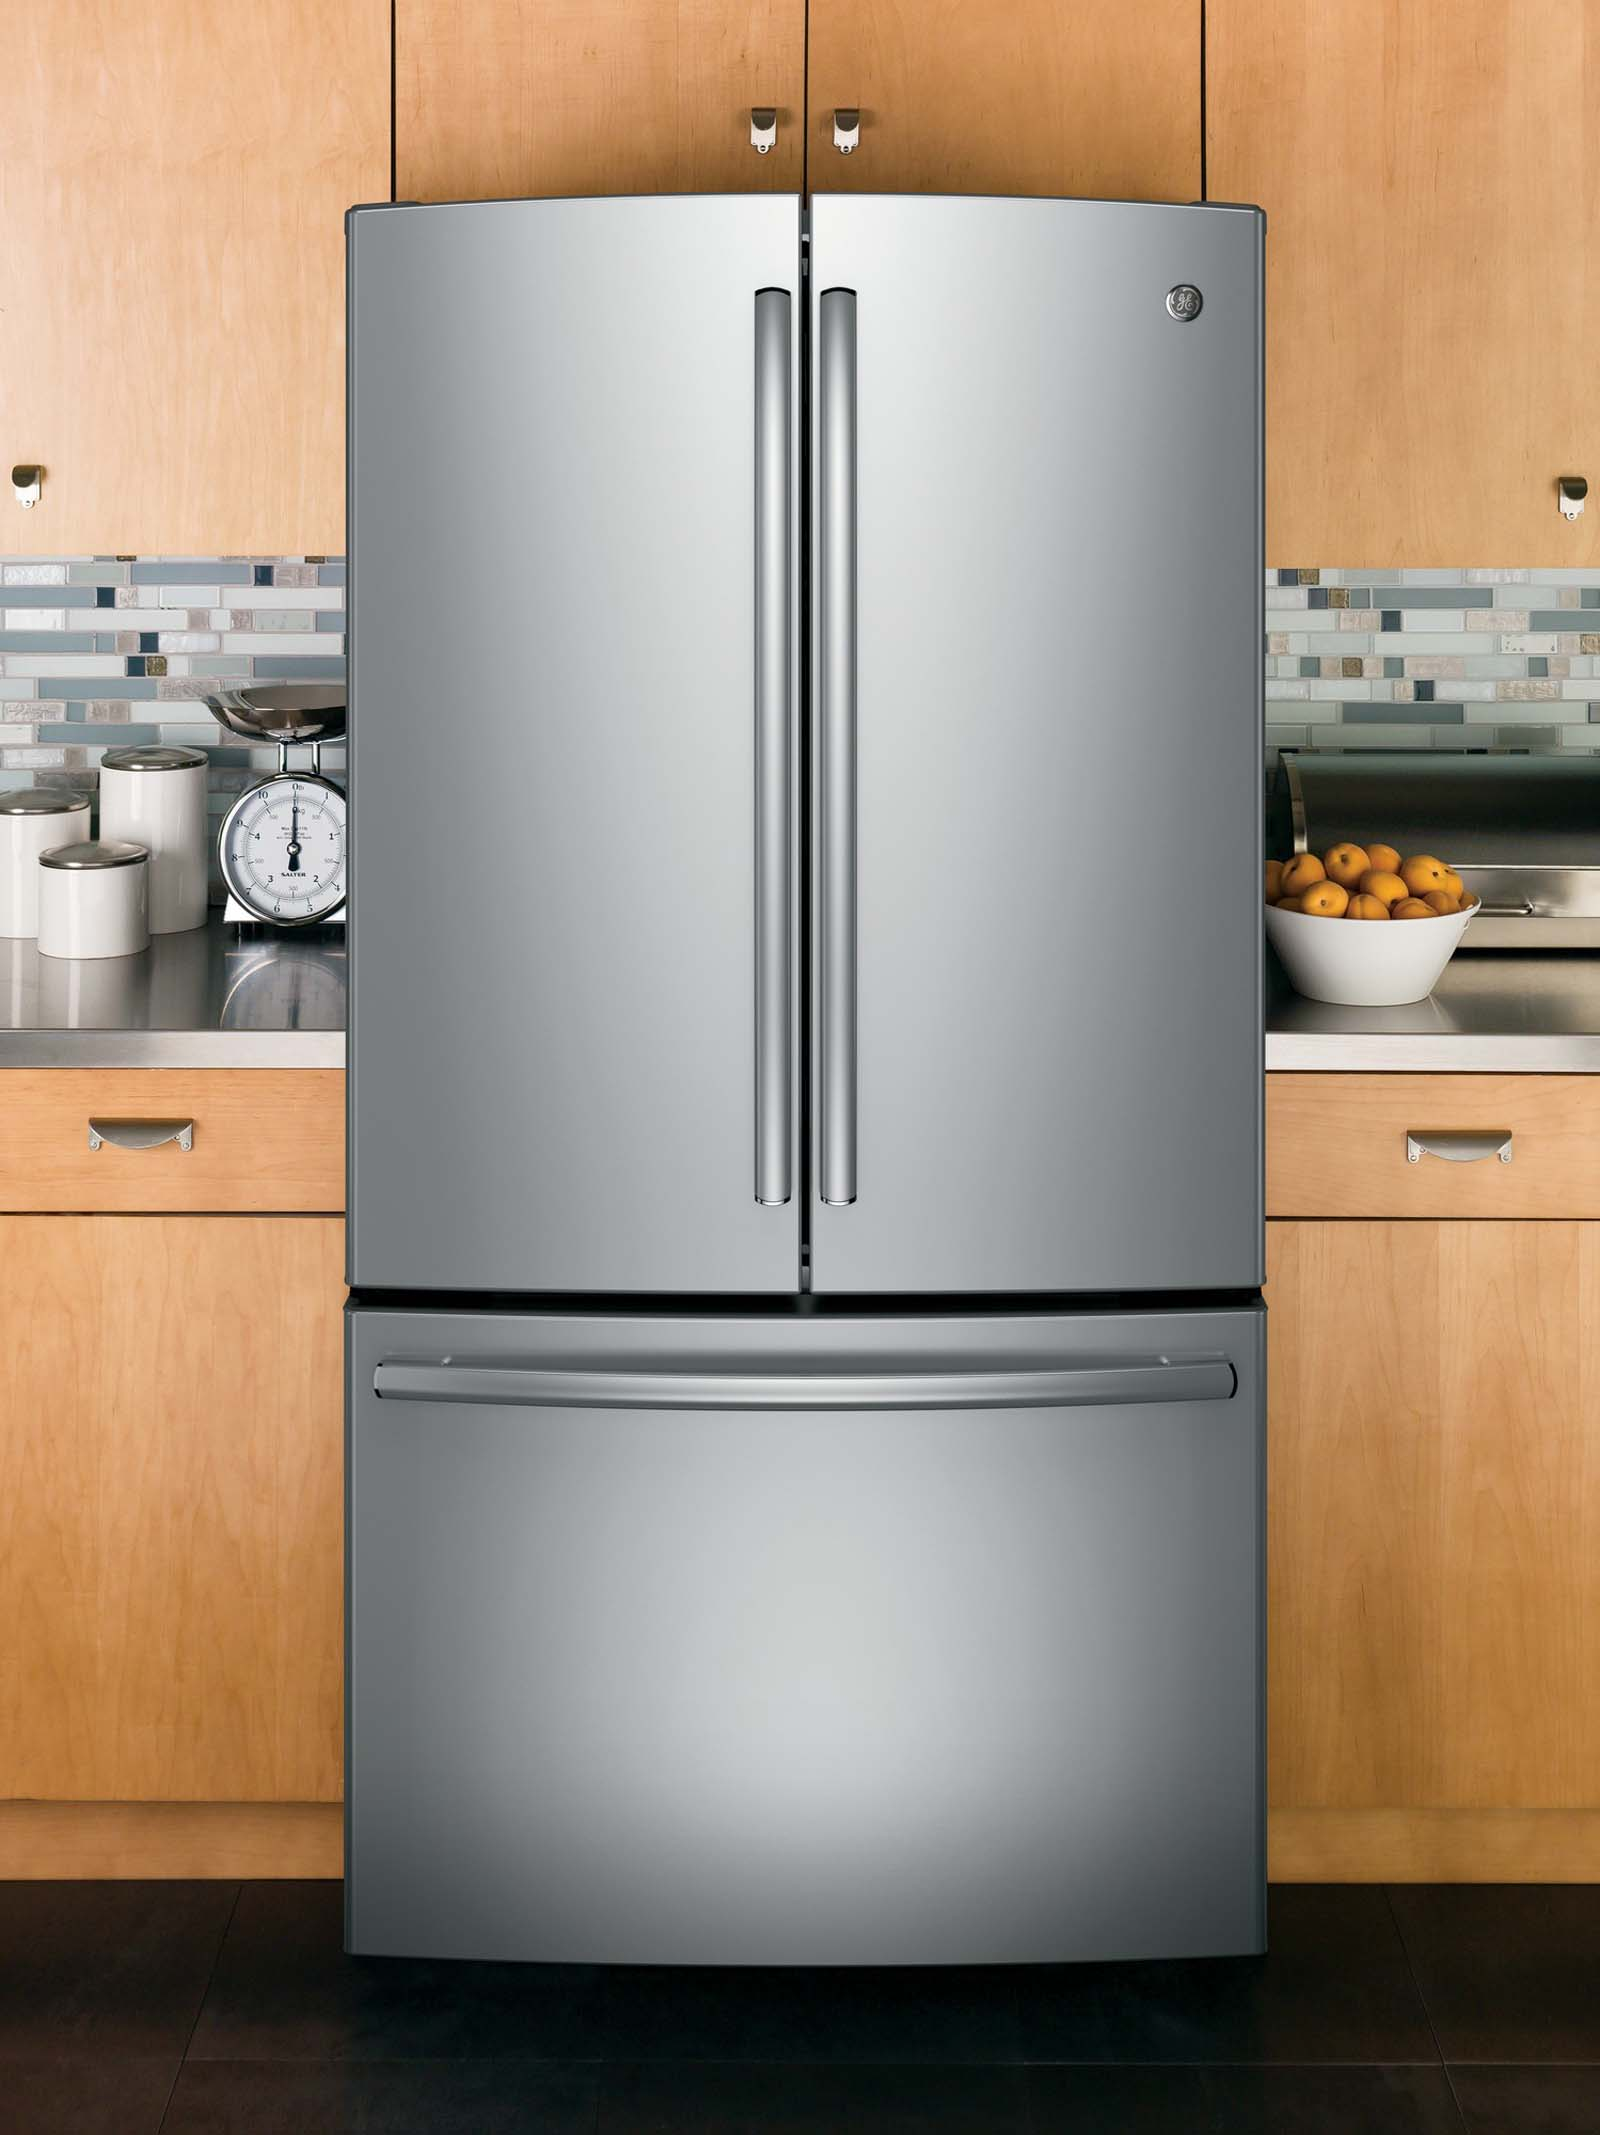 GE Appliances GNE29GSHSS 28.5 cu. ft. French-Door Refrigerator - Stainless Steel